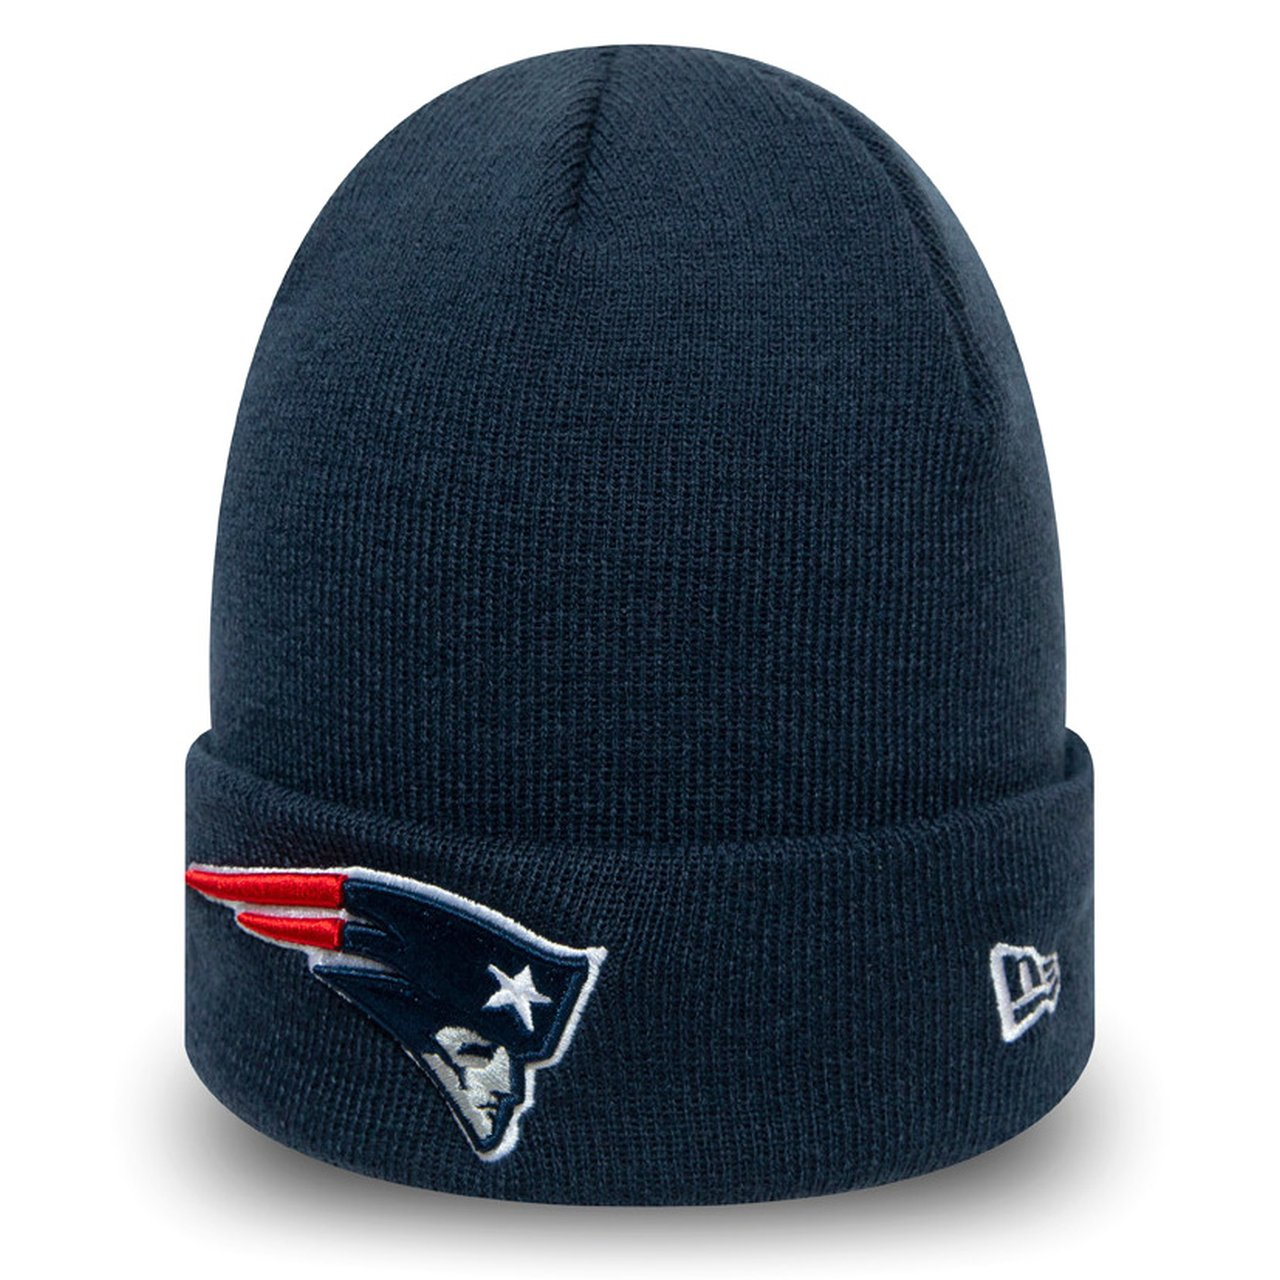 New Era Strick Winterm/ütze Skull Beanie New England Patriots